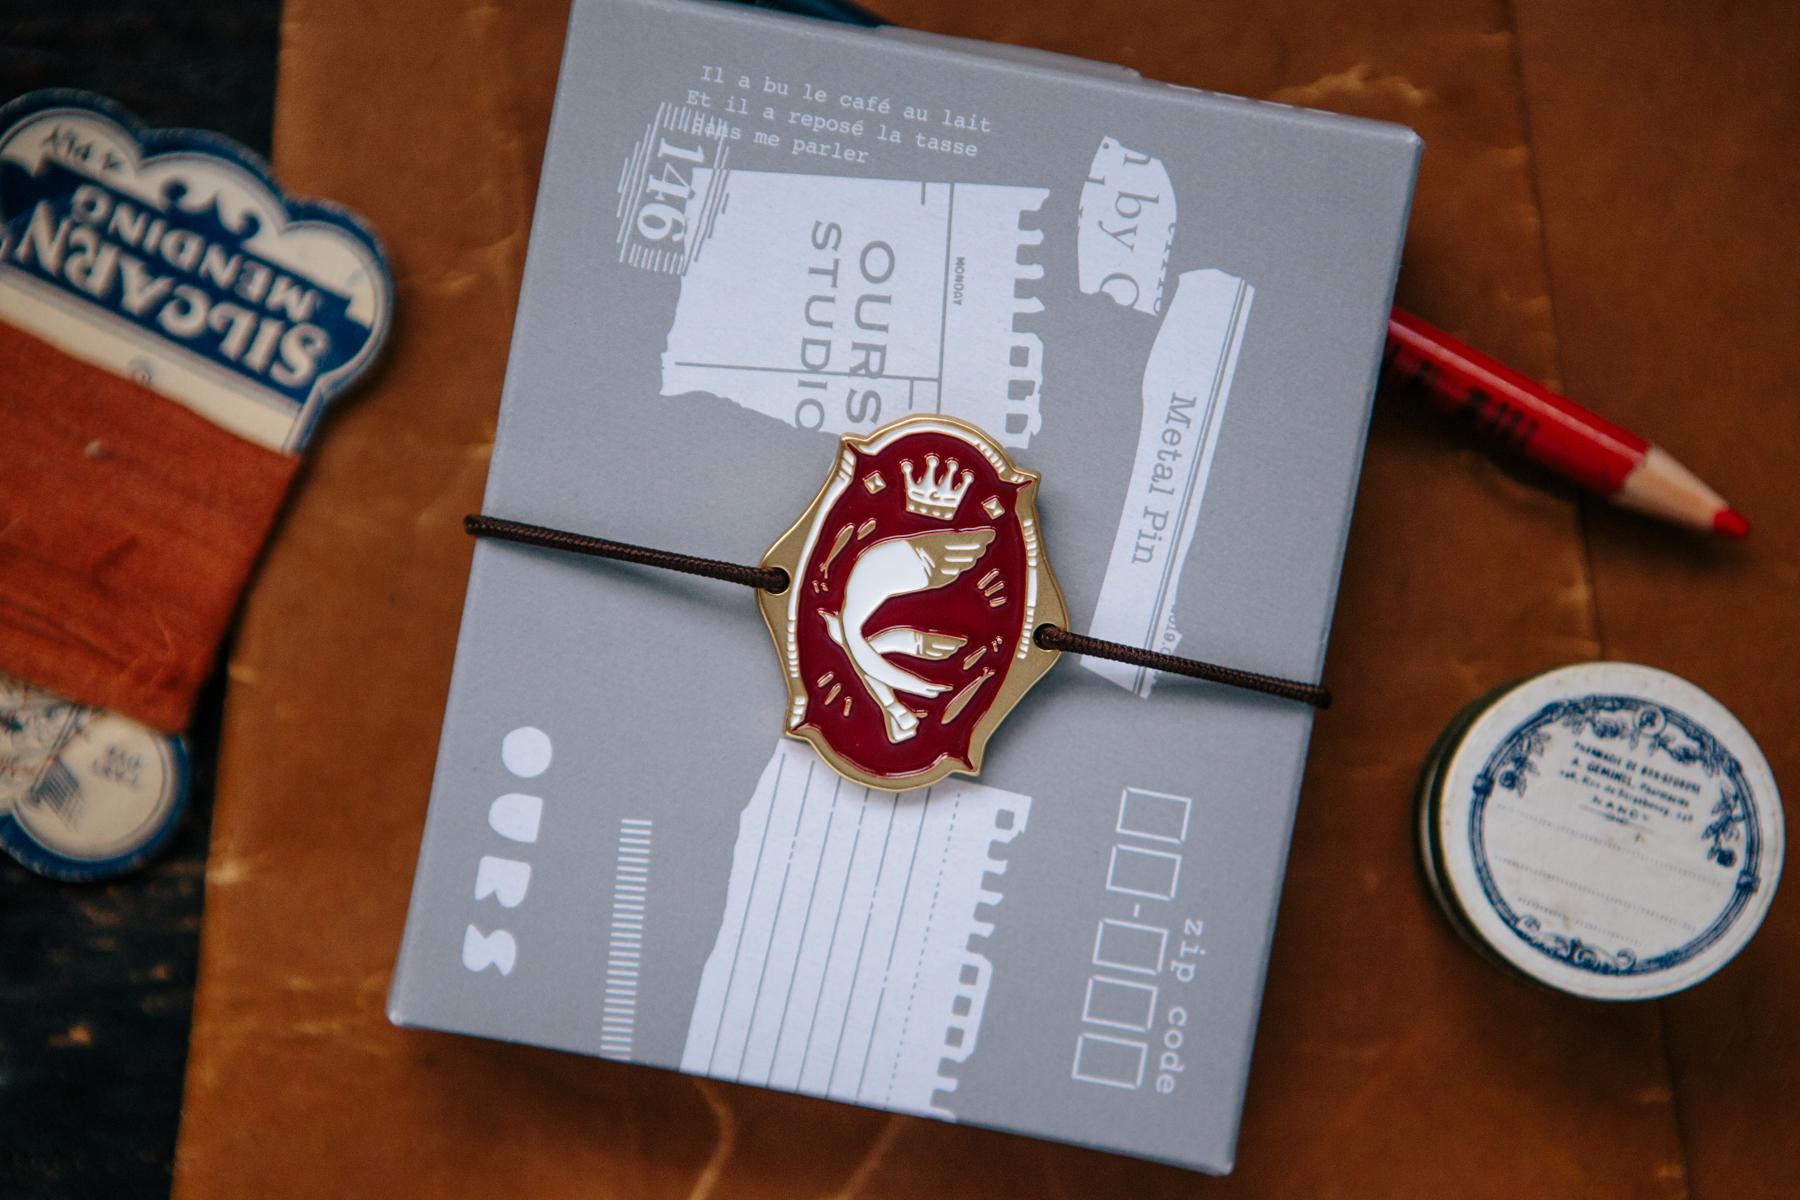 OURS 抽屜之中 紅色信使鳥 金屬 書綁 飾物